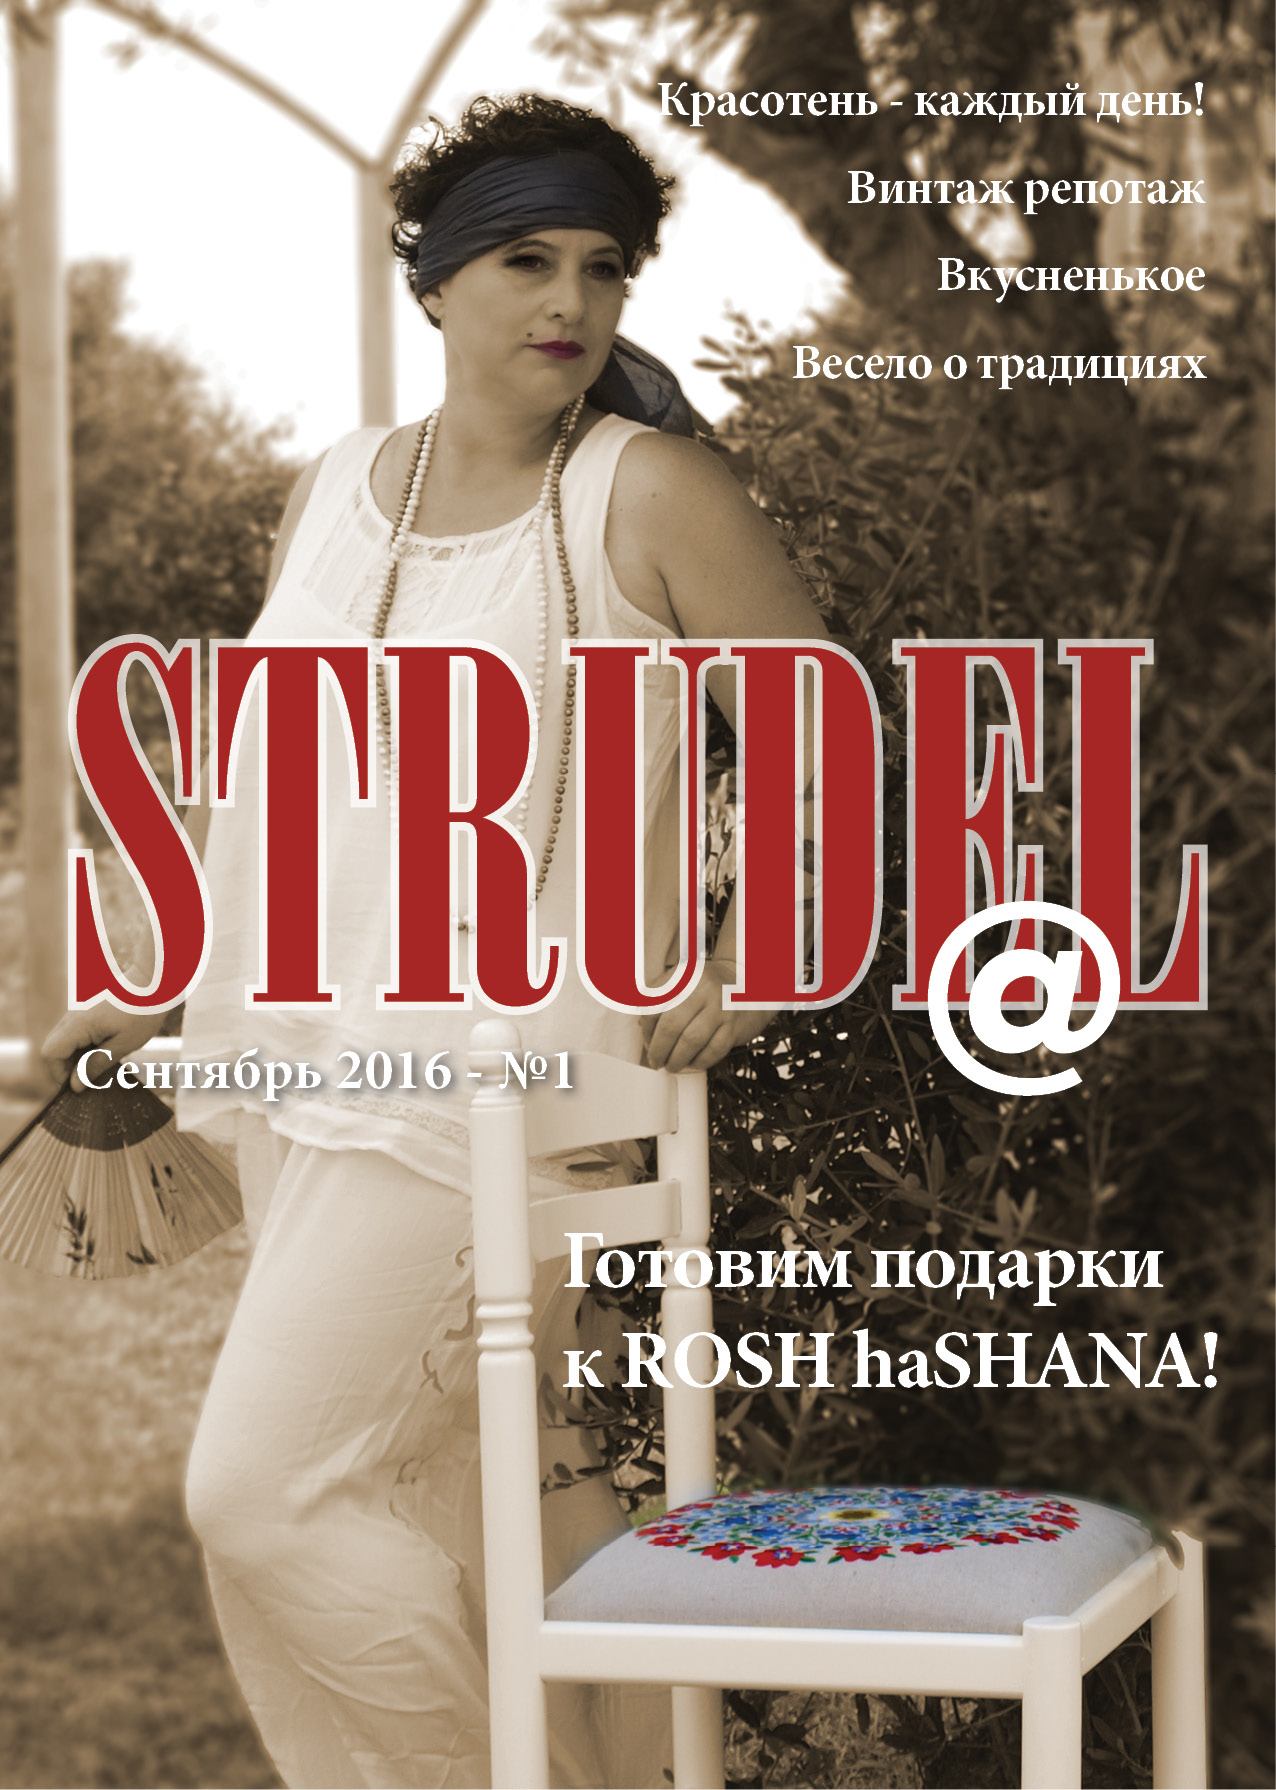 strudel1-09-16